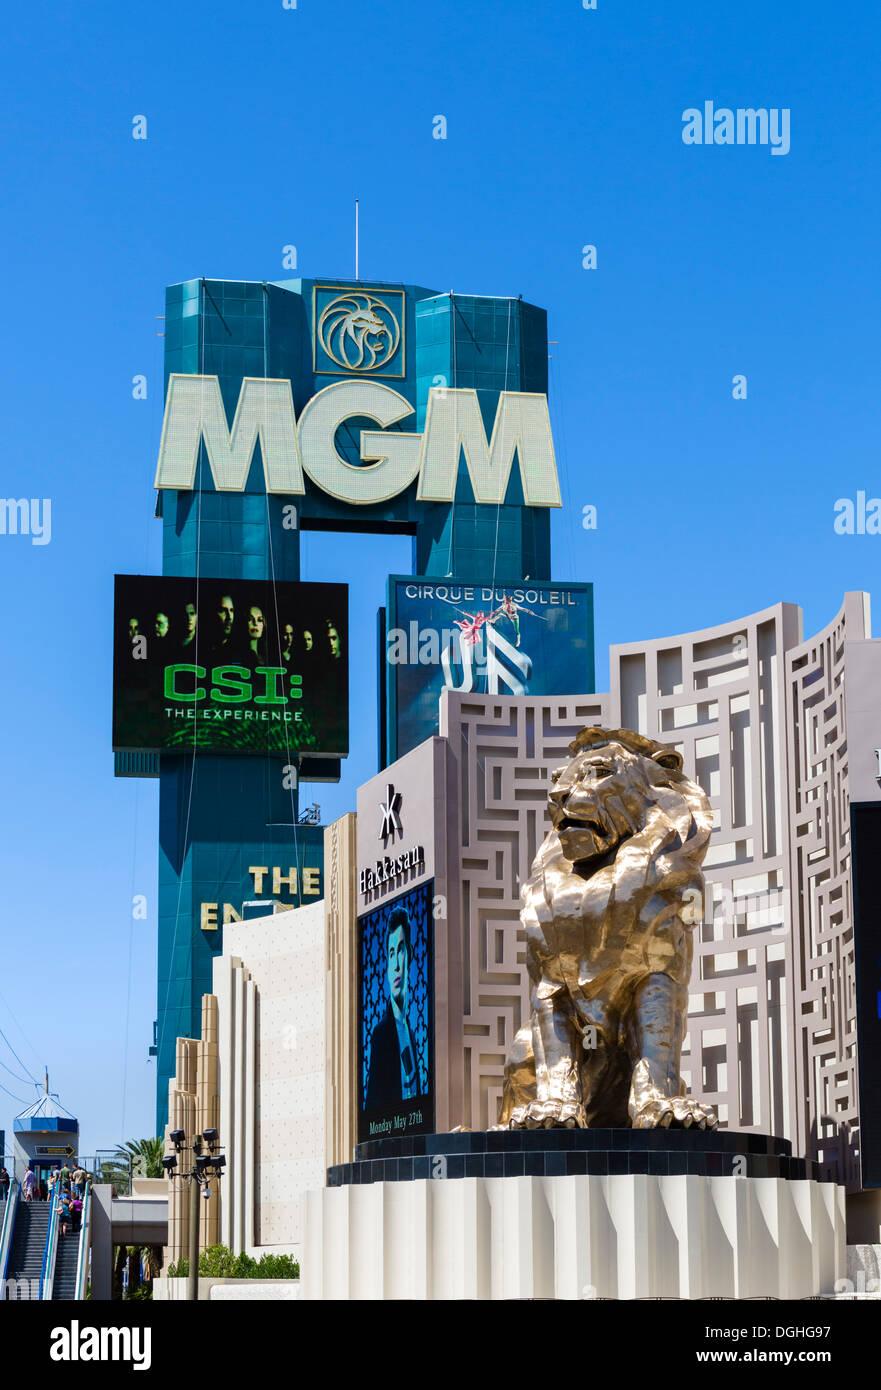 The Las Vegas Boulevard South (The Strip) entrance to the MGM Grand hotel and casino, Las Vegas, Nevada, USA - Stock Image